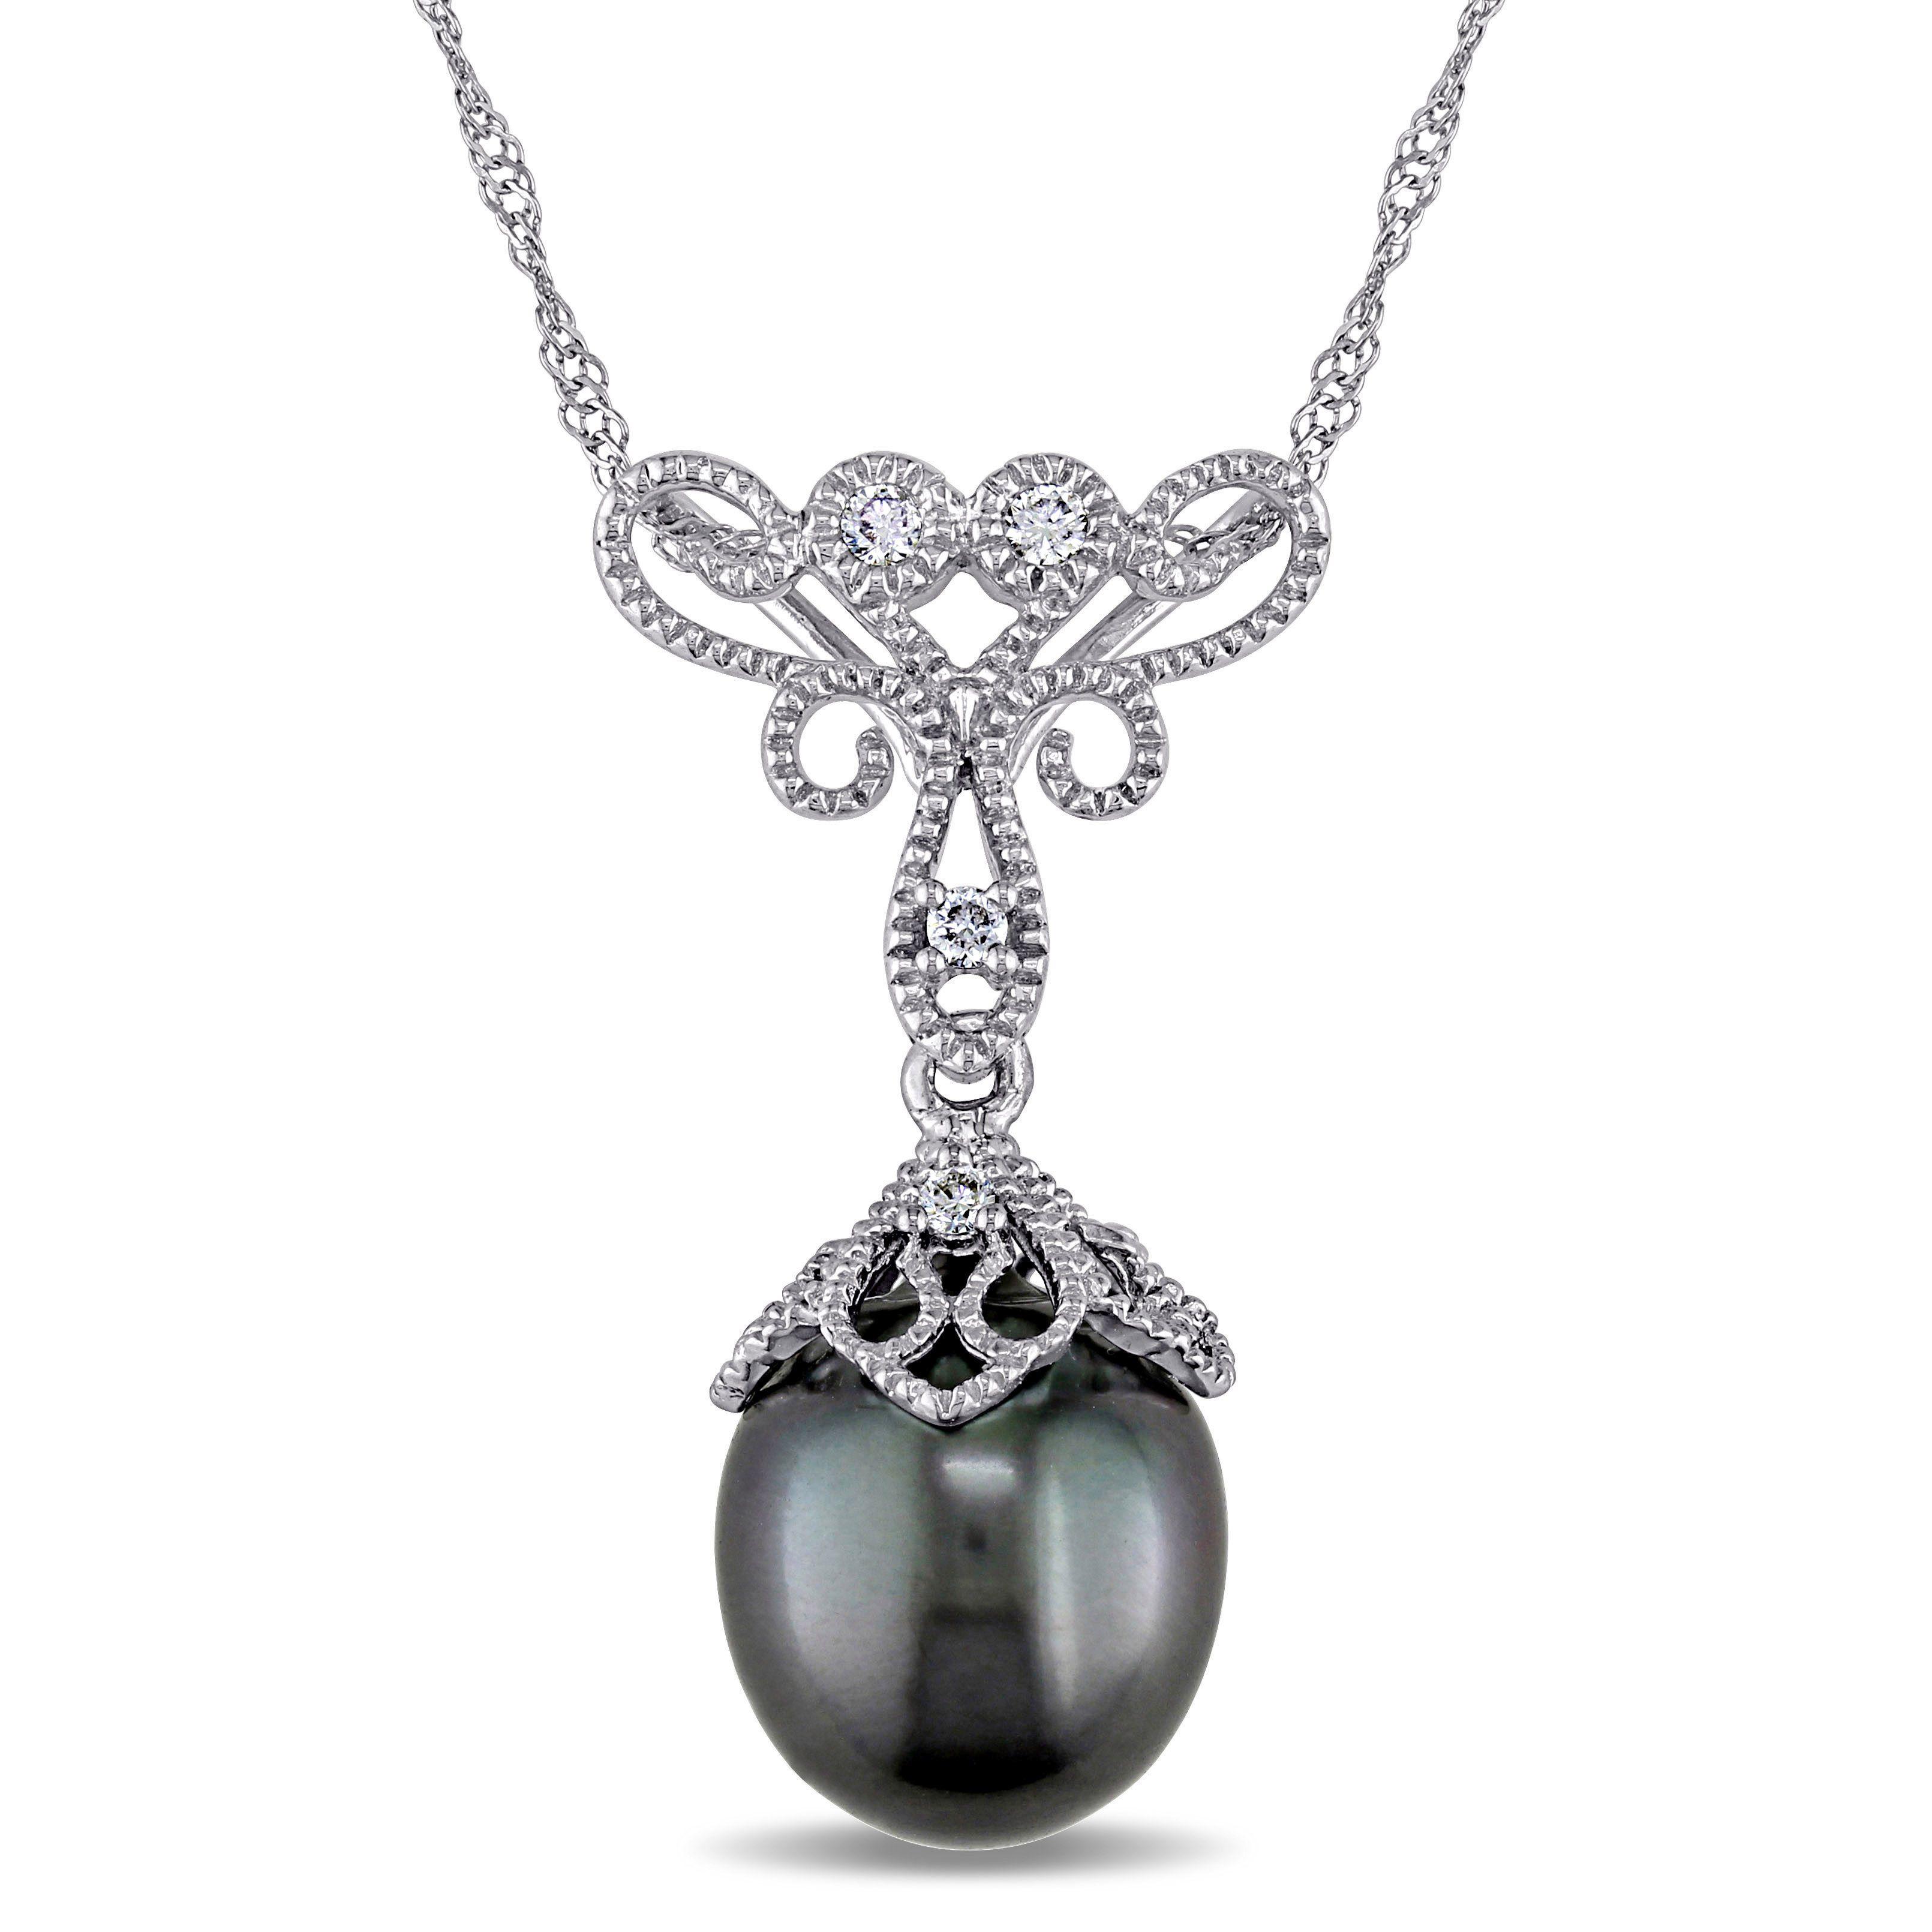 Diamond black tahitian pearl pendant necklace 14k white gold 9 diamond black tahitian pearl pendant necklace 14k white gold 9 95mm aloadofball Images